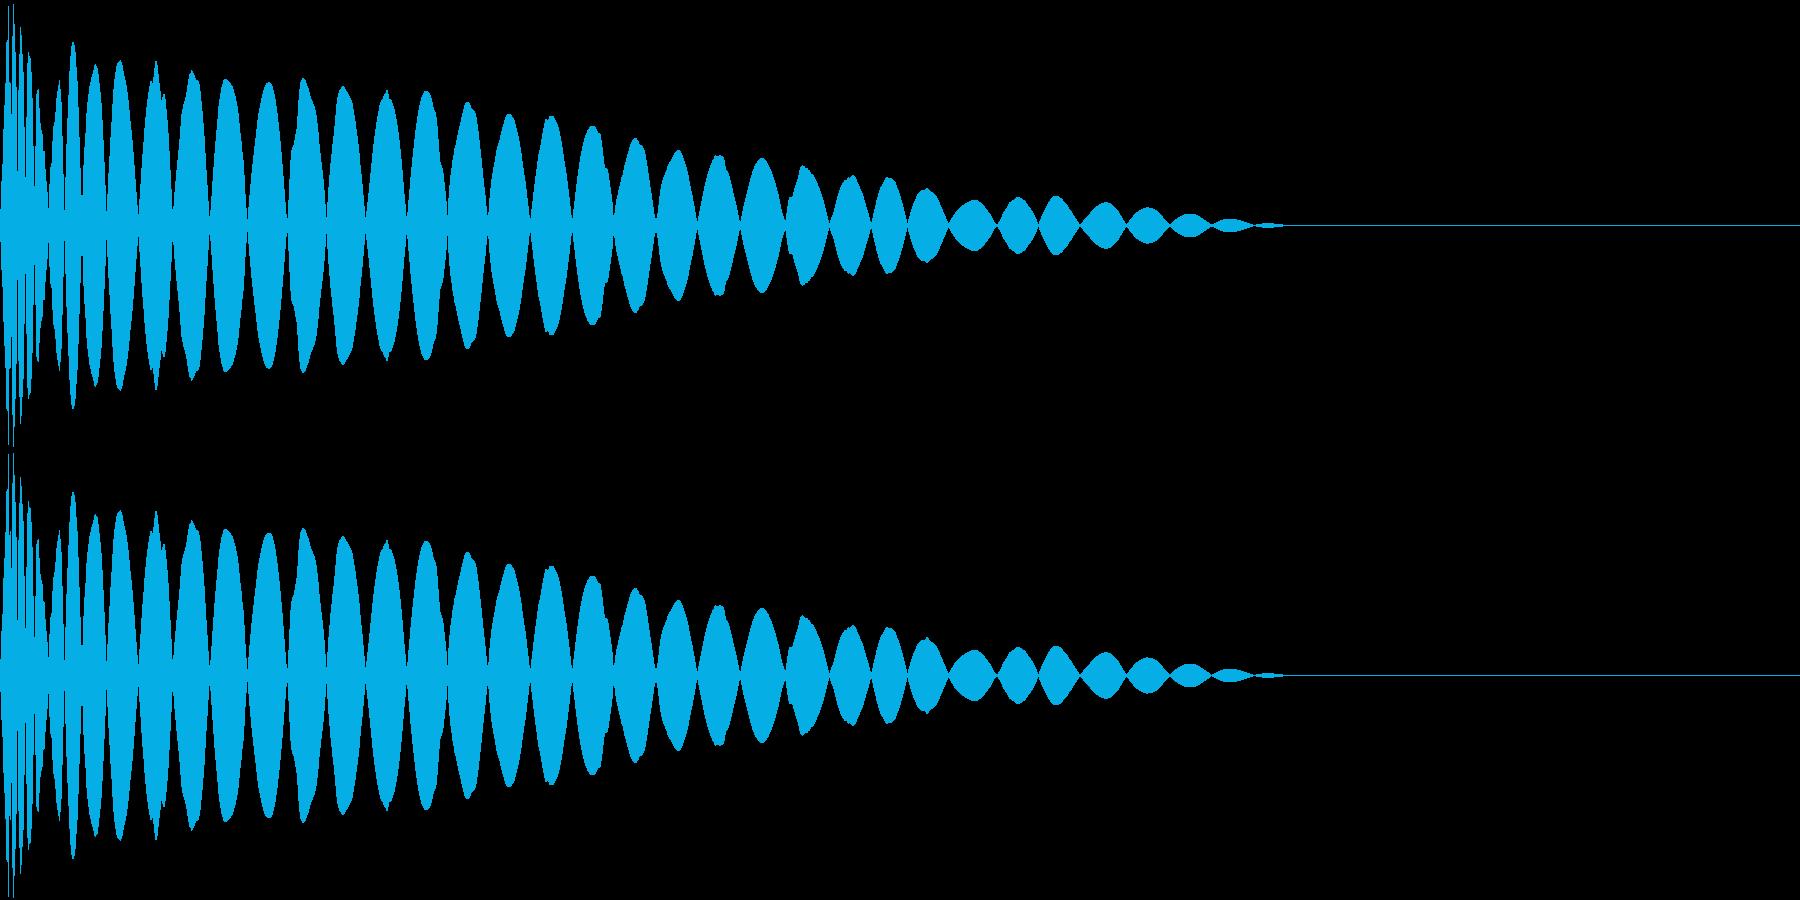 DTM Kick 93 オリジナル音源の再生済みの波形